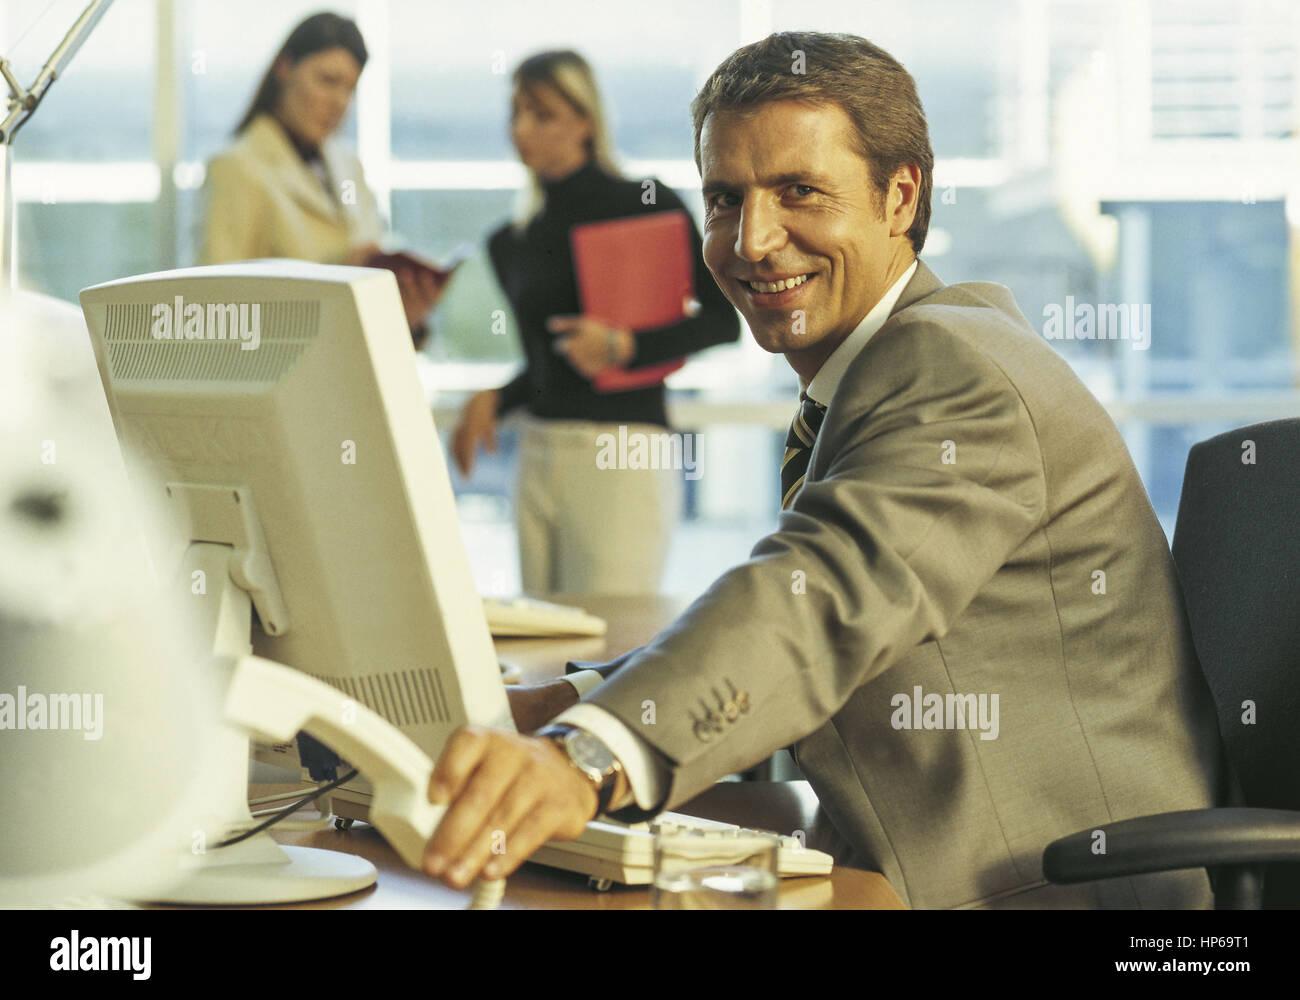 Manager am Schreibtisch, legt Telefonhoerer auf (model-released) - Stock Image